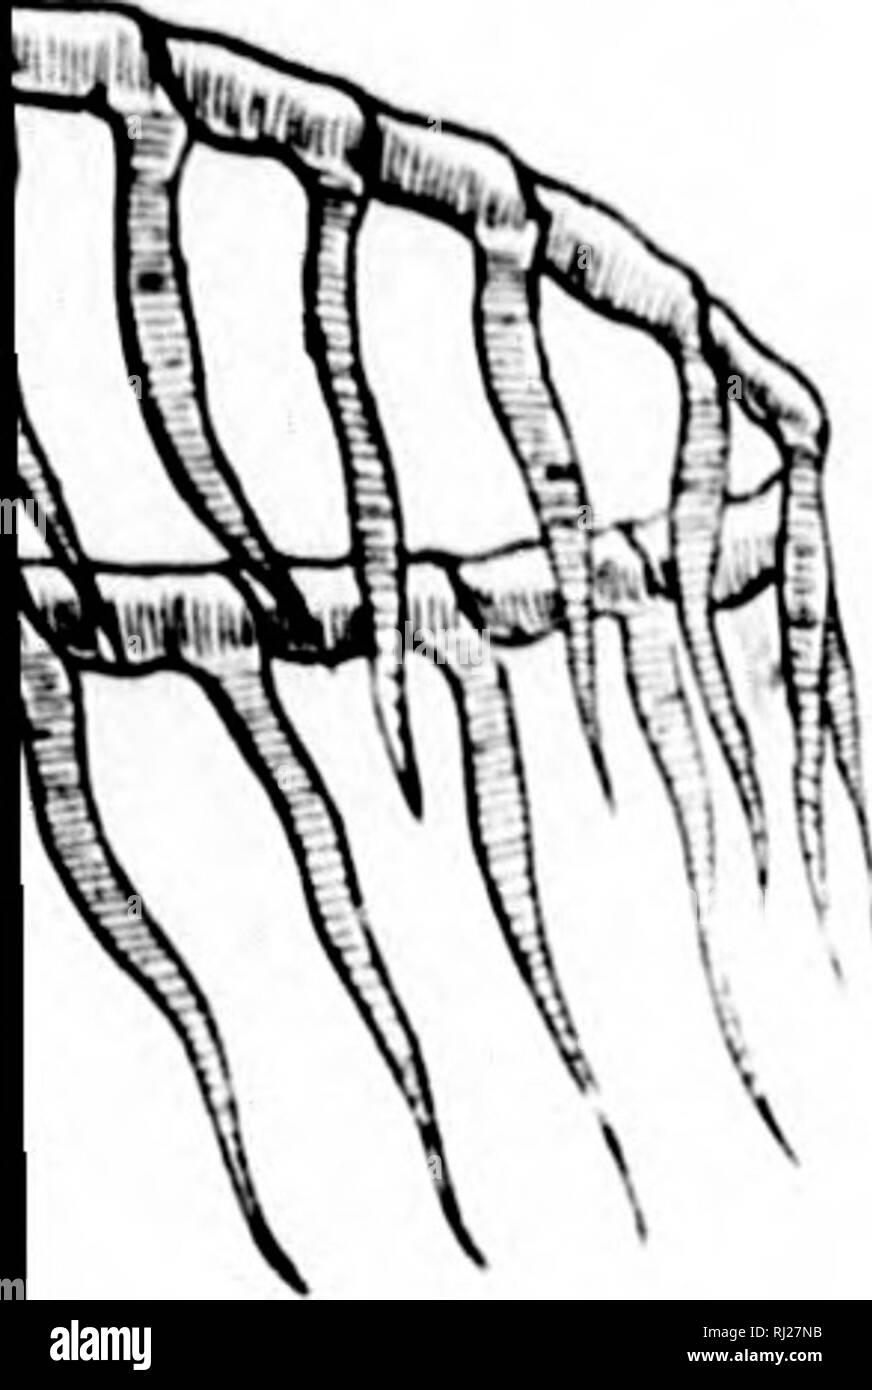 . Amphioxus and the ancestry of the vertebrates [microform]. Vertebrates; Chordata; Fishes; Ascidiacea; Vertébrés; Cordés; Poissons; Ascidiacés. EXTERNAL EORM. 19 ohanncs Mu^ ^'-apparatus,: lyoid or ton^ the jaw-bear; itcs, but tr ;) the same I., the moiith-Q: the Cyclost ⢠I'hicli posscjv .rti]ai;e in a.: 1 the labial; of Selach:.,, >sence ot pa;:. of any kiiii; i>rL;'an has b.. d above. TIk .'er, a iiicdi. 1 eonsisls 1: vely laii;!' :; s:t remit - oft:. al cartilafj(.â .-, of A' Mi'I.I.KK.'l 1 1 ti) ftui in liiciii.^ 11(1 fai'h l).i>.ii piiJ process into V :i:al cirrus. ukcn u - Stock Image